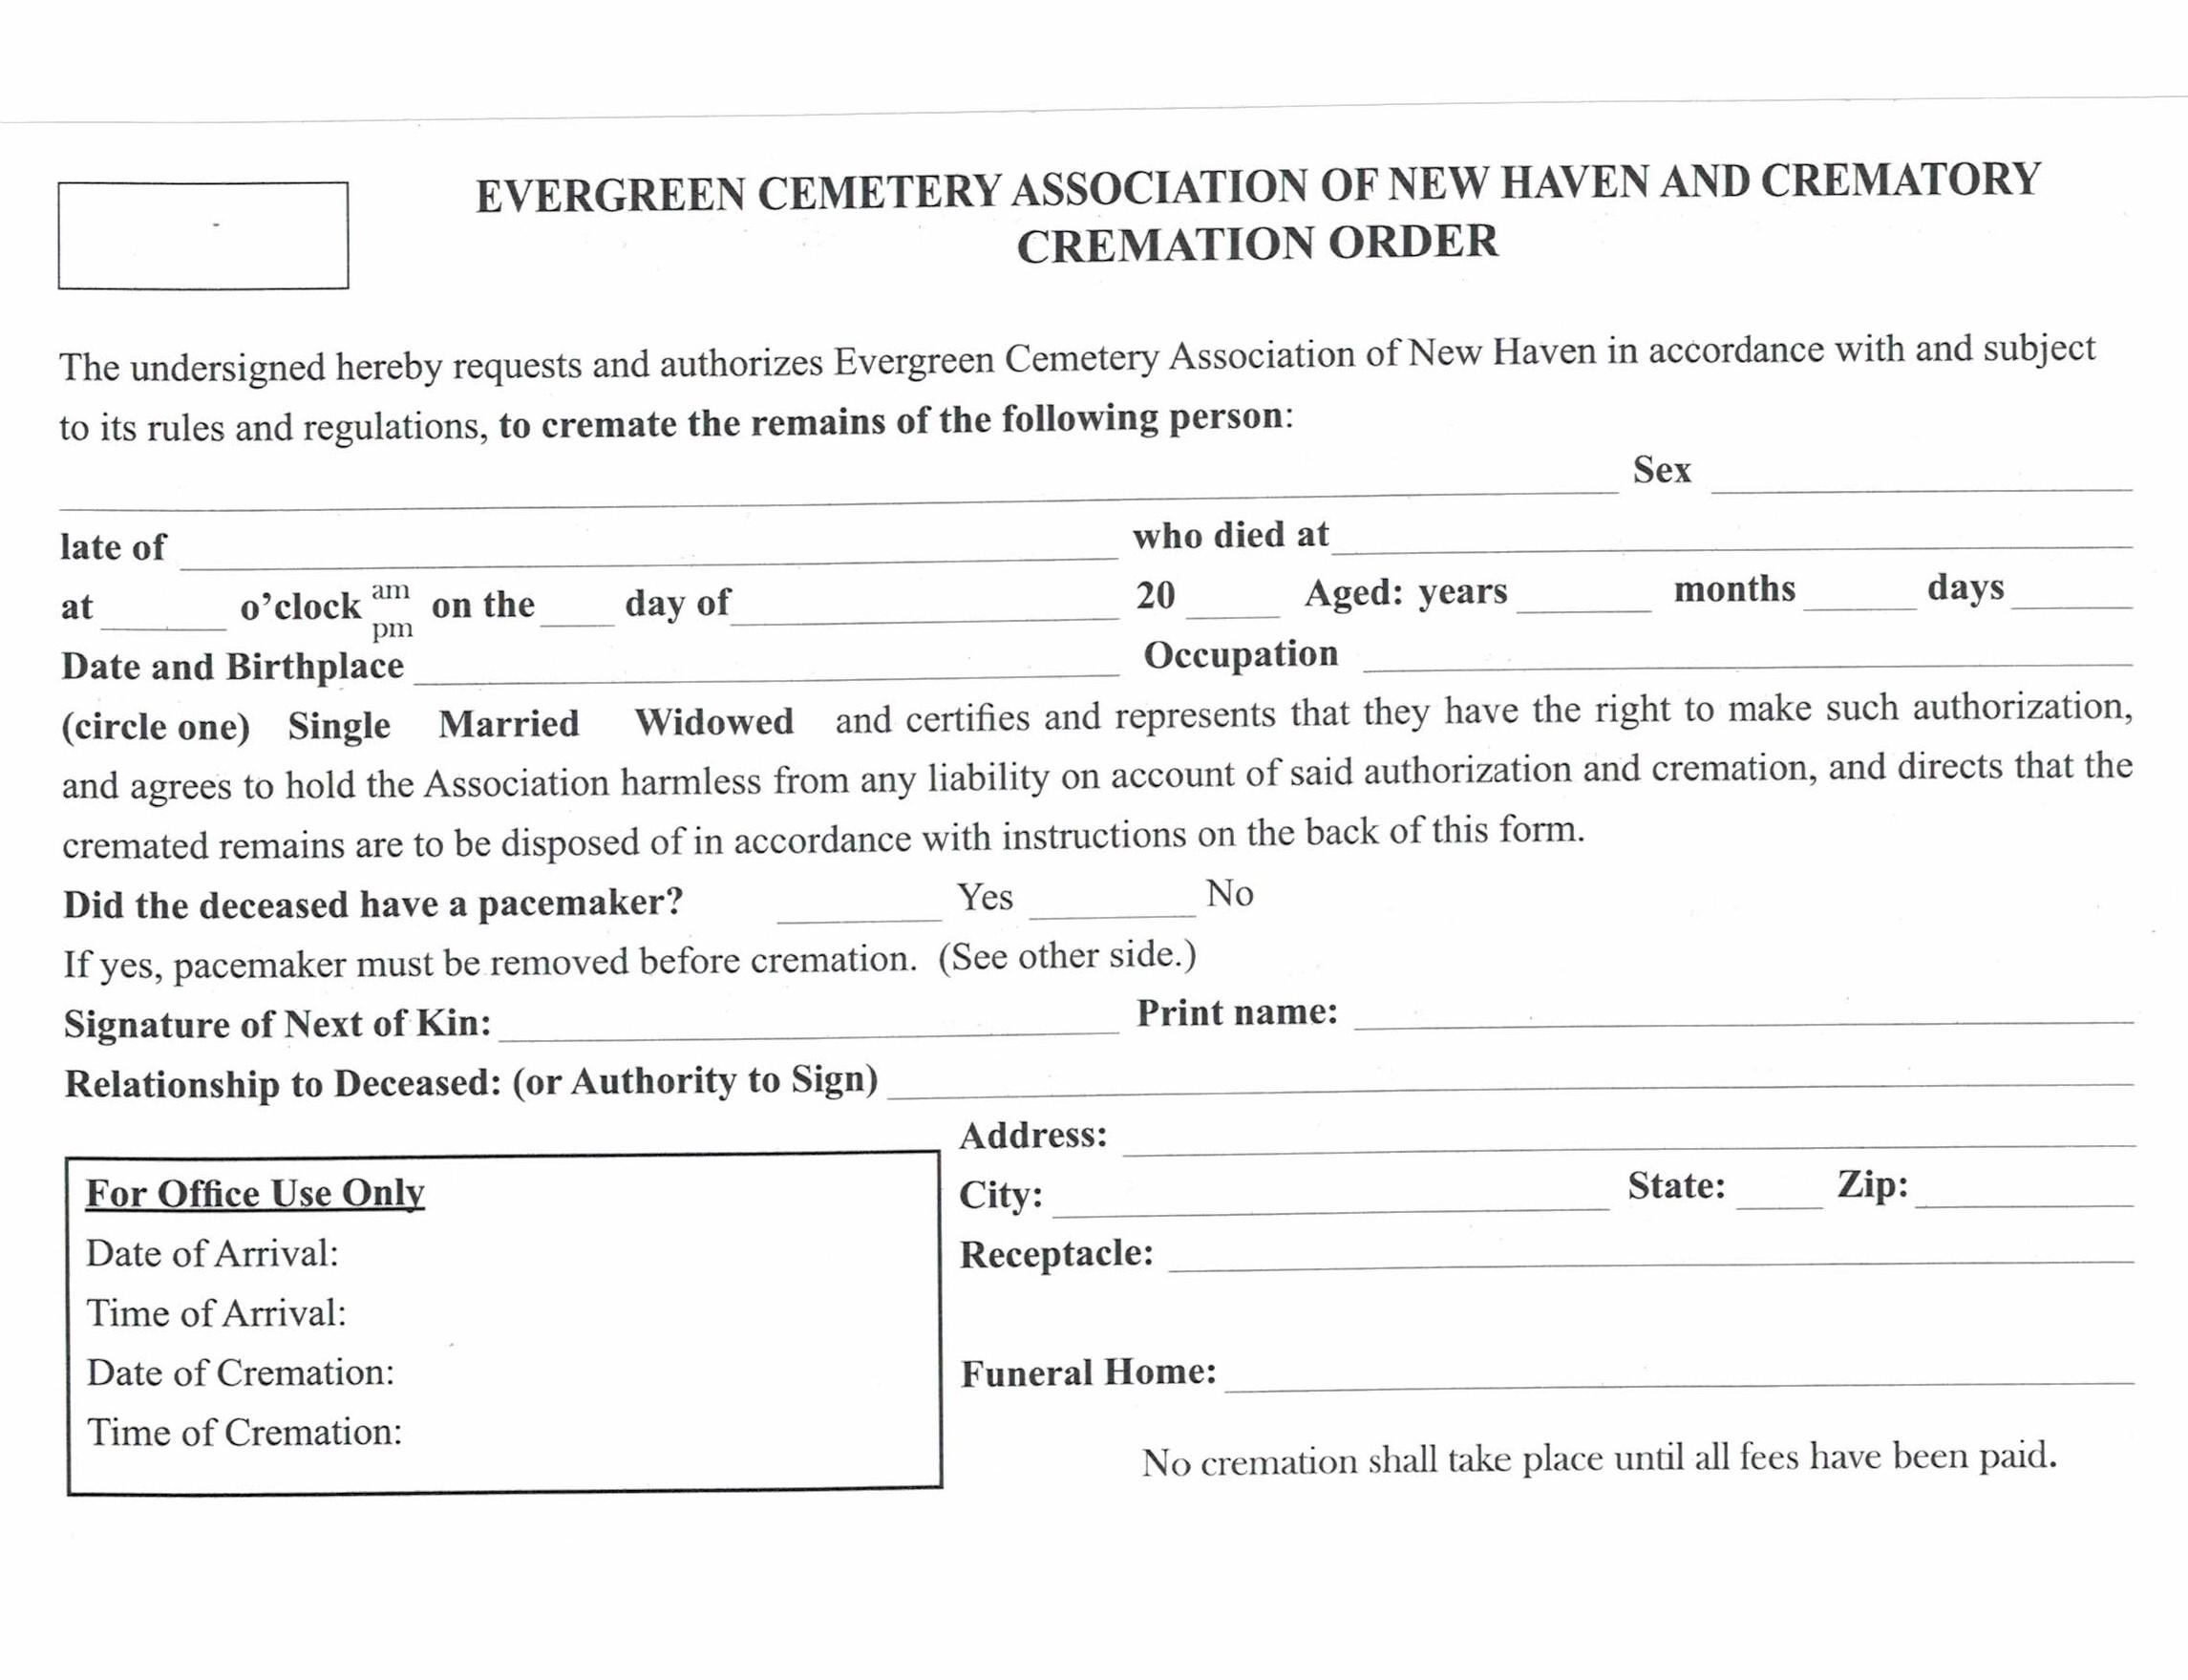 blank EG permit